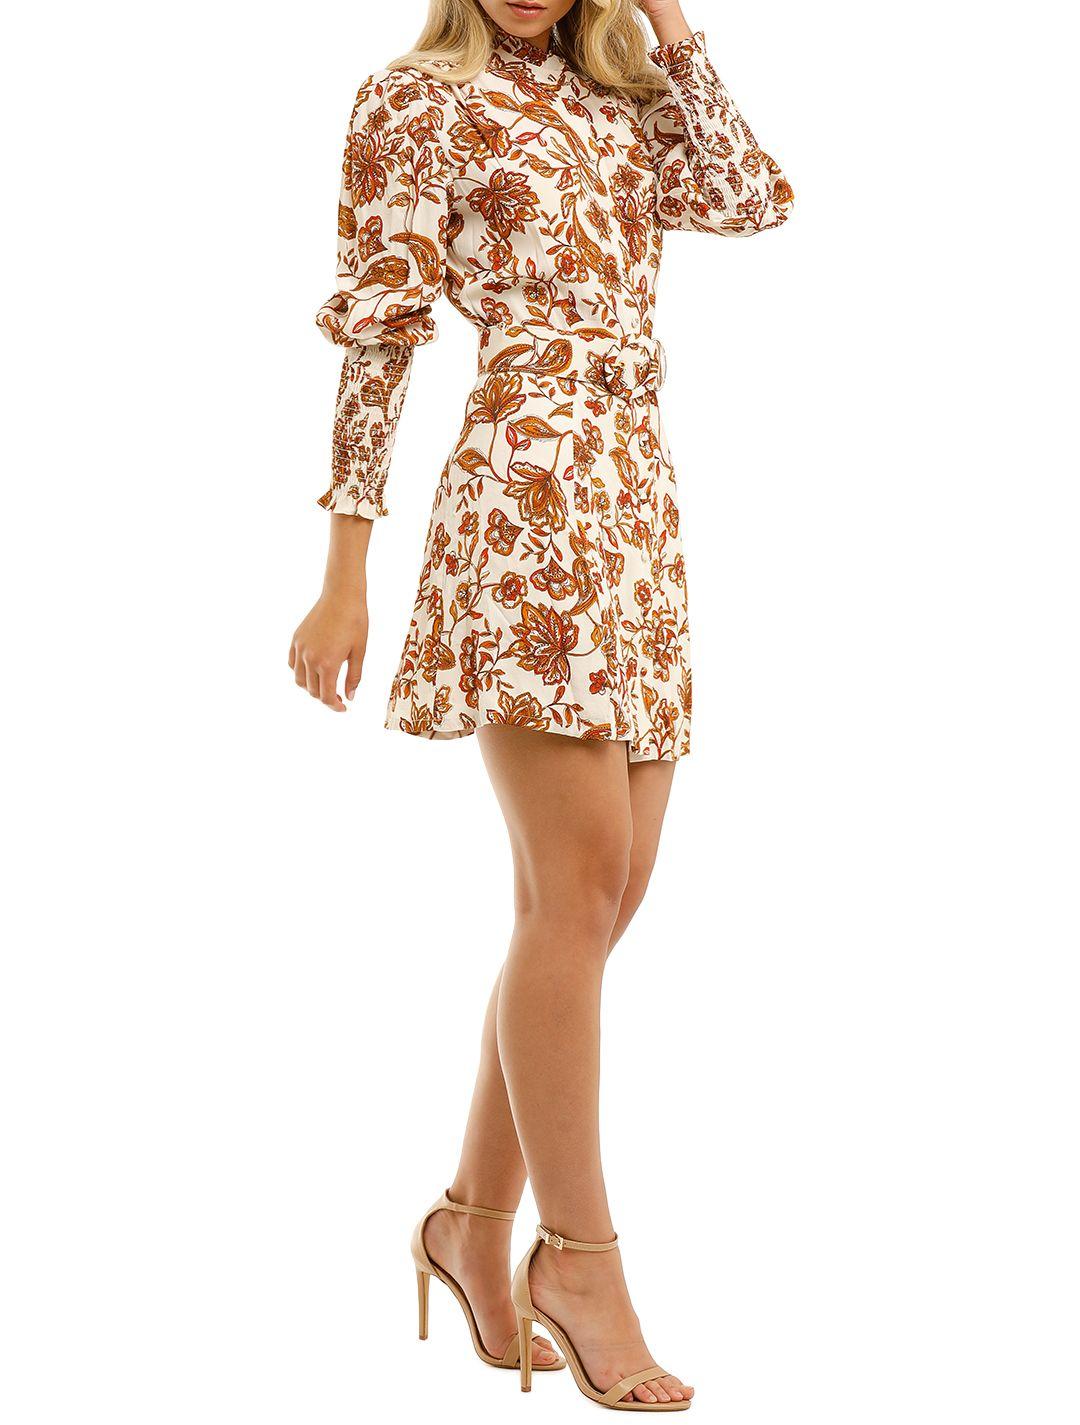 Nicholas-Agadir-Dress-Ivory-Paisley-Floral-Print-Side